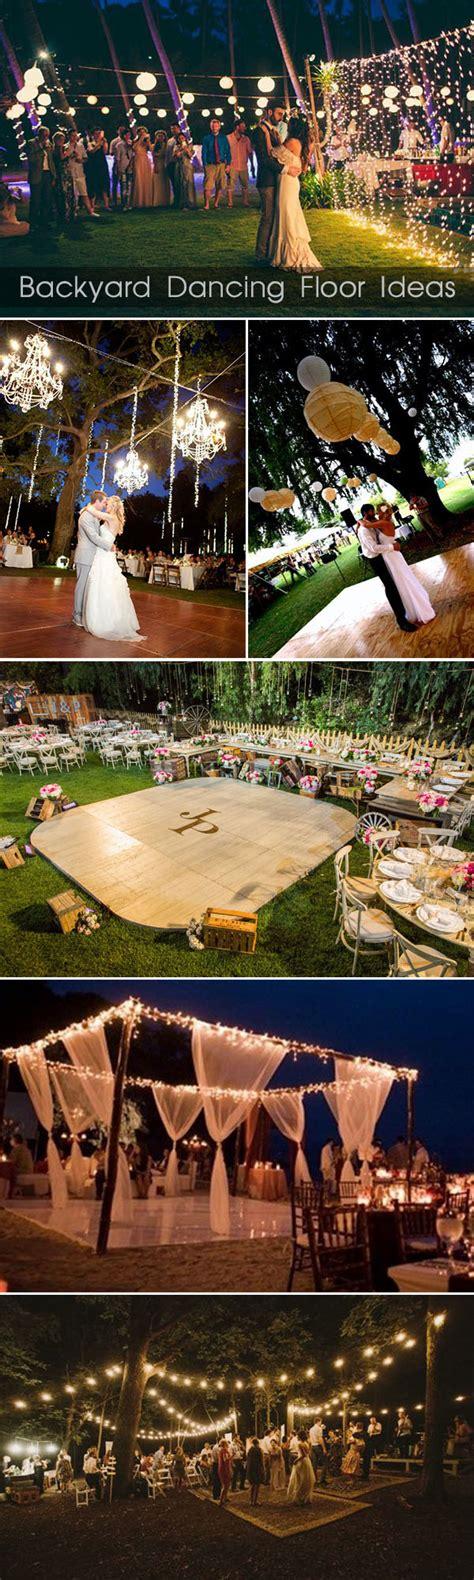 outdoor backyard wedding ideas 30 sweet ideas for intimate backyard outdoor weddings